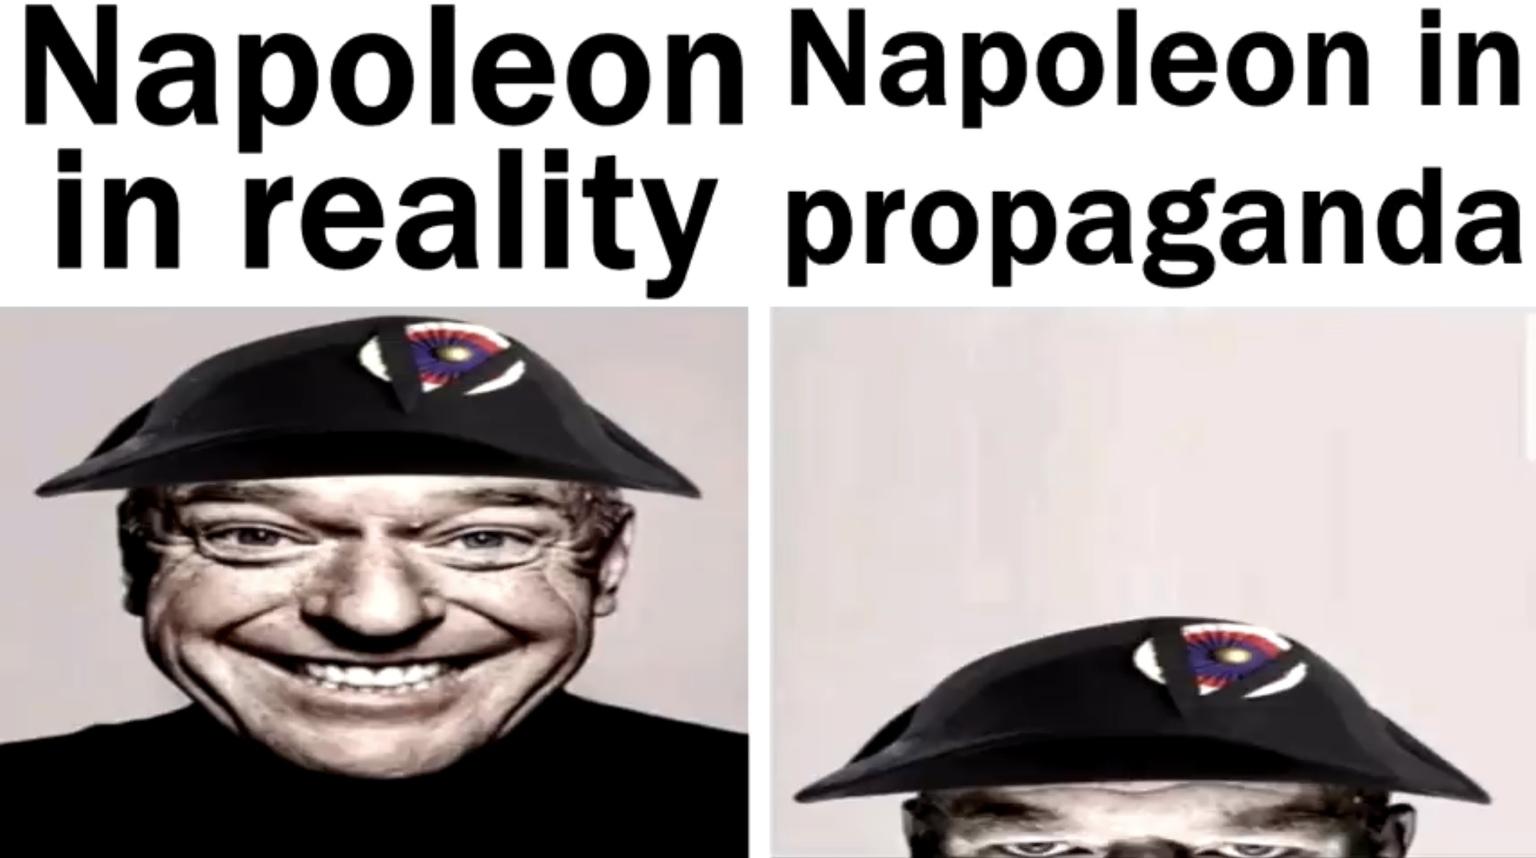 Napoleon - meme